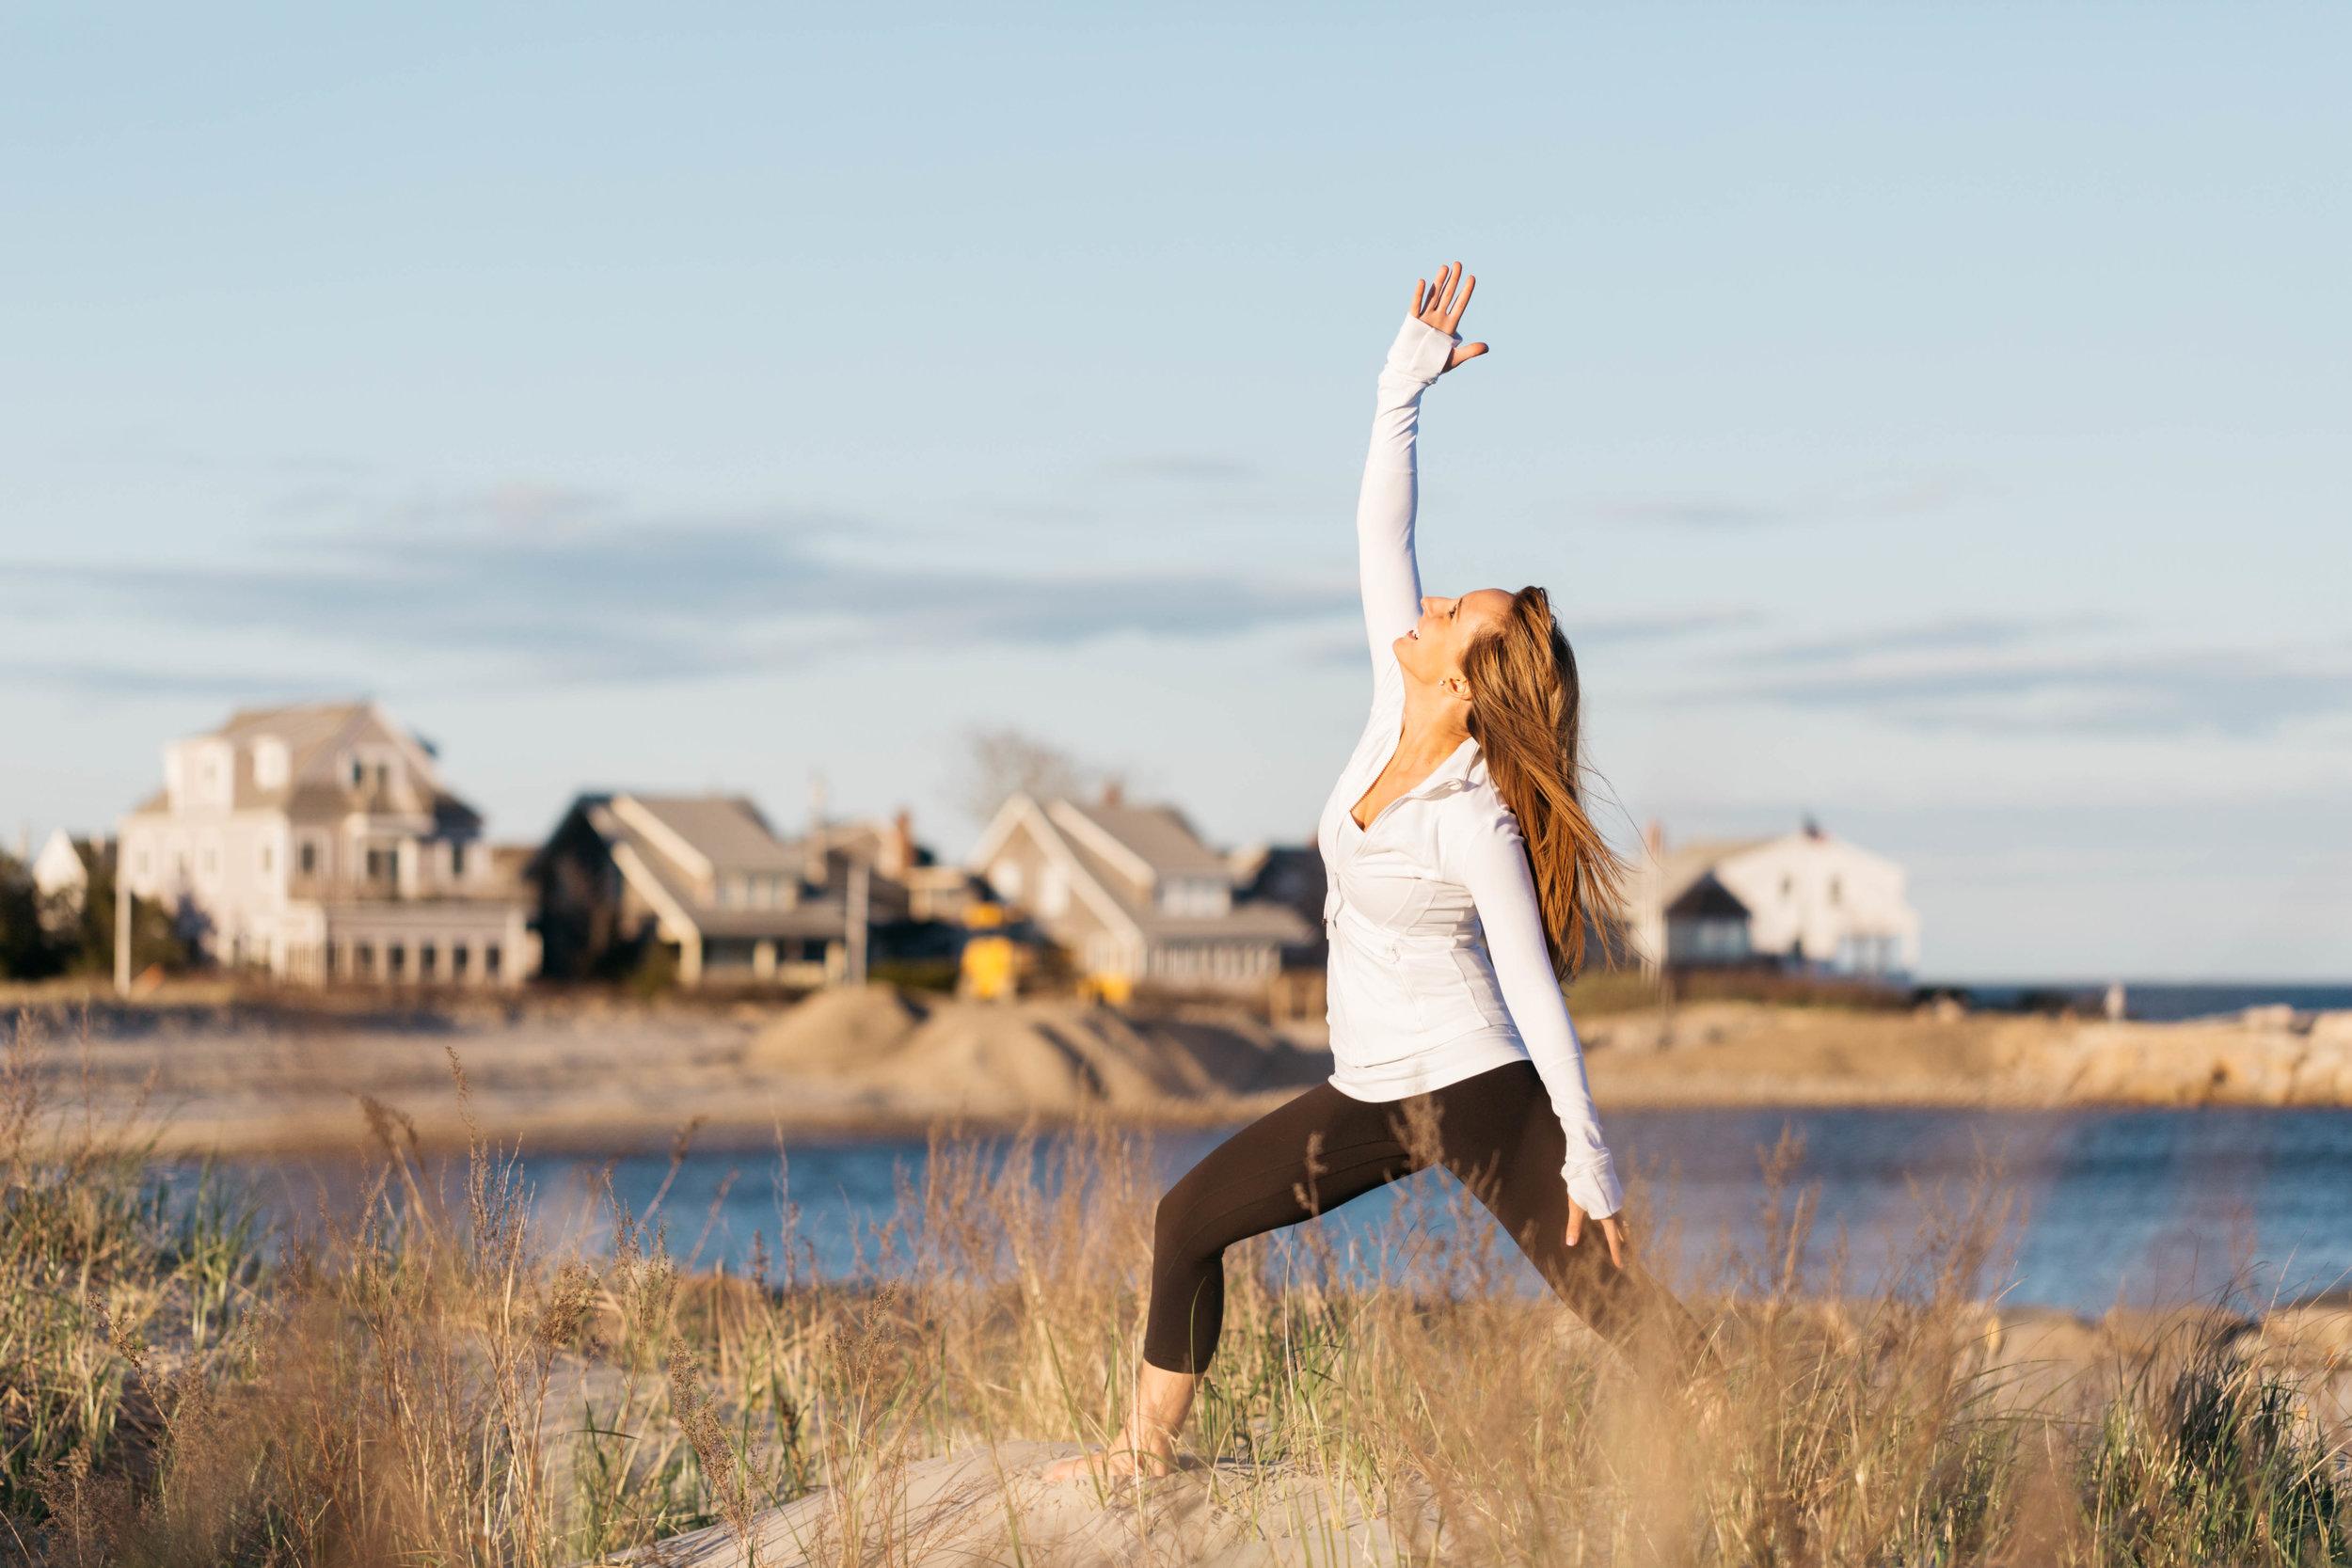 boston-yoga-photographer-kerry-7.jpg